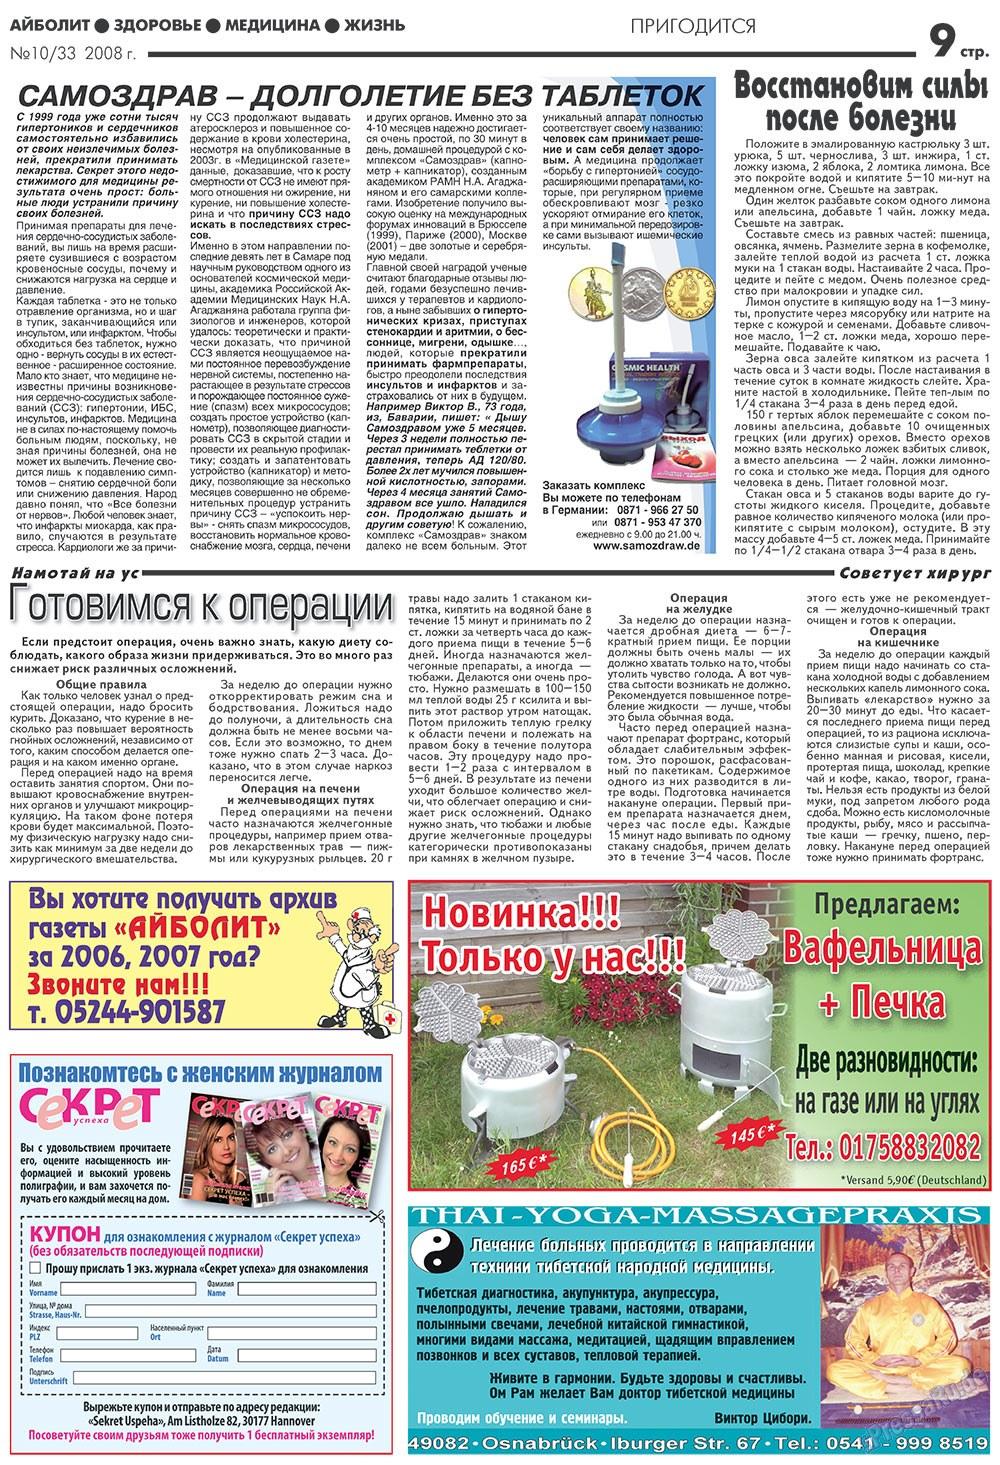 АйБолит (газета). 2008 год, номер 10, стр. 9